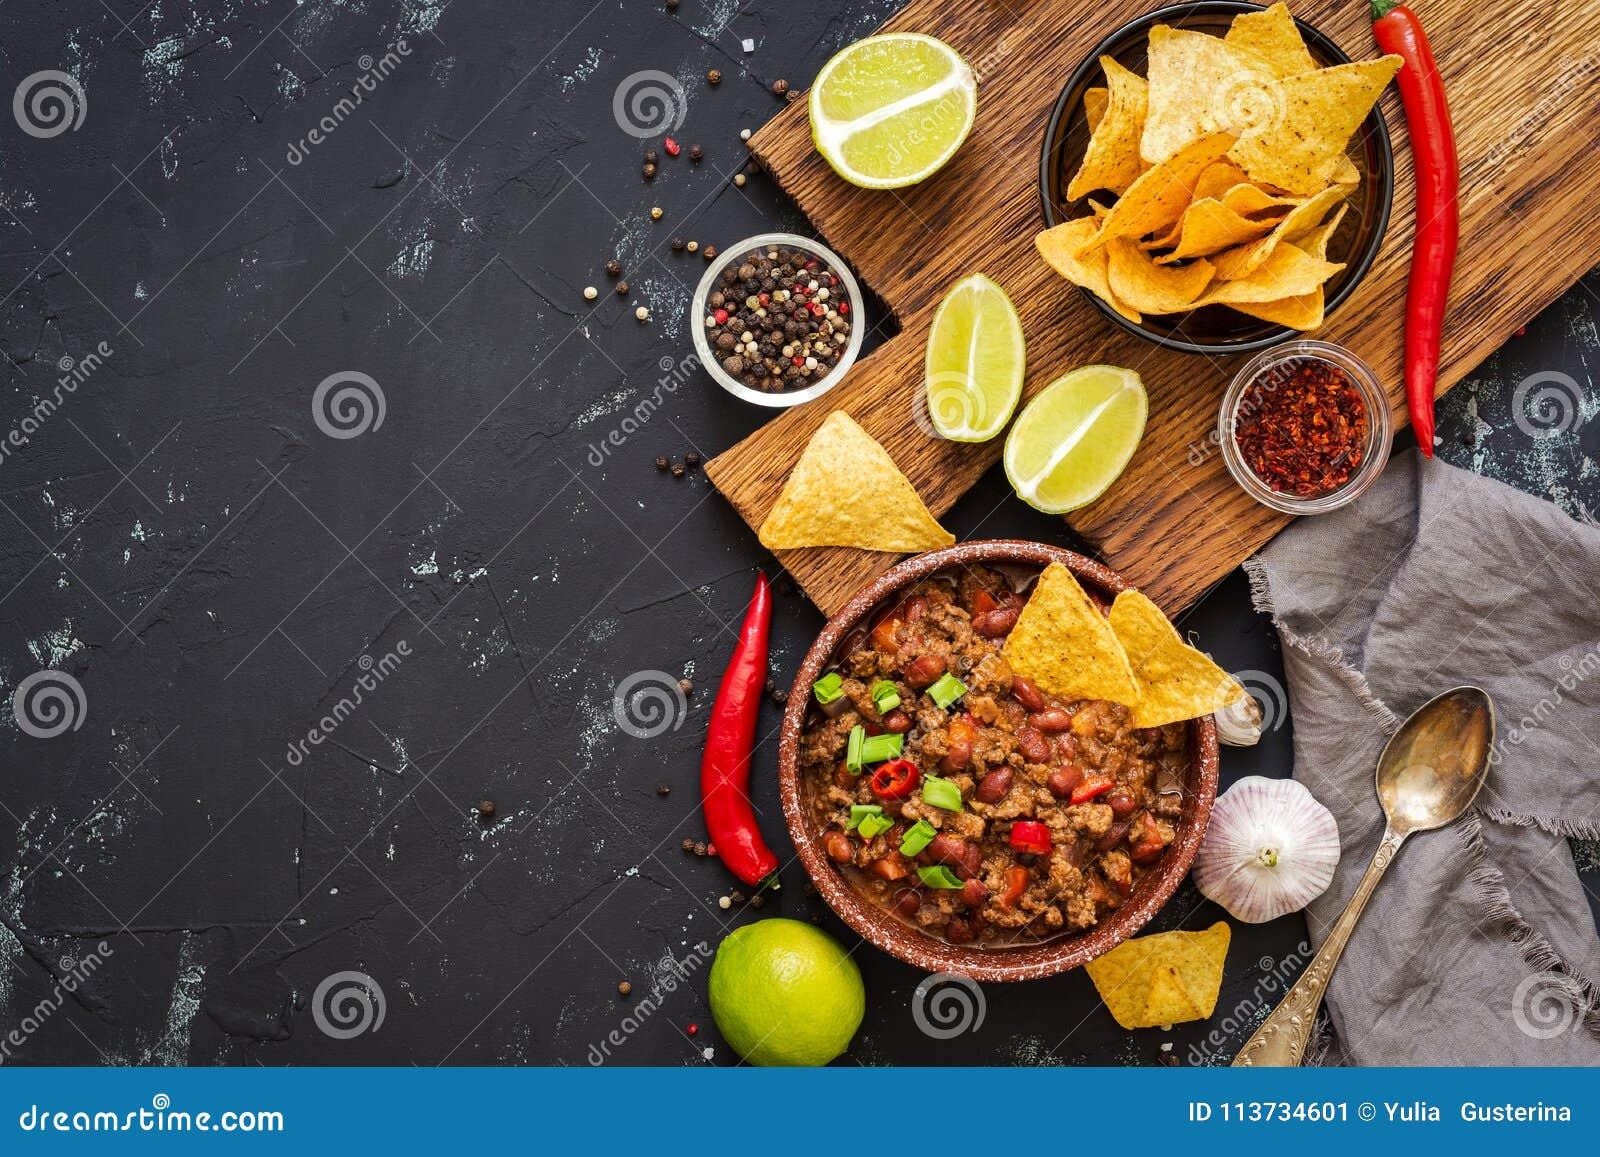 Chili con carne met nachosspaanders op rustieke achtergrond Mexicaans voedsel Plaats voor tekst, hoogste mening